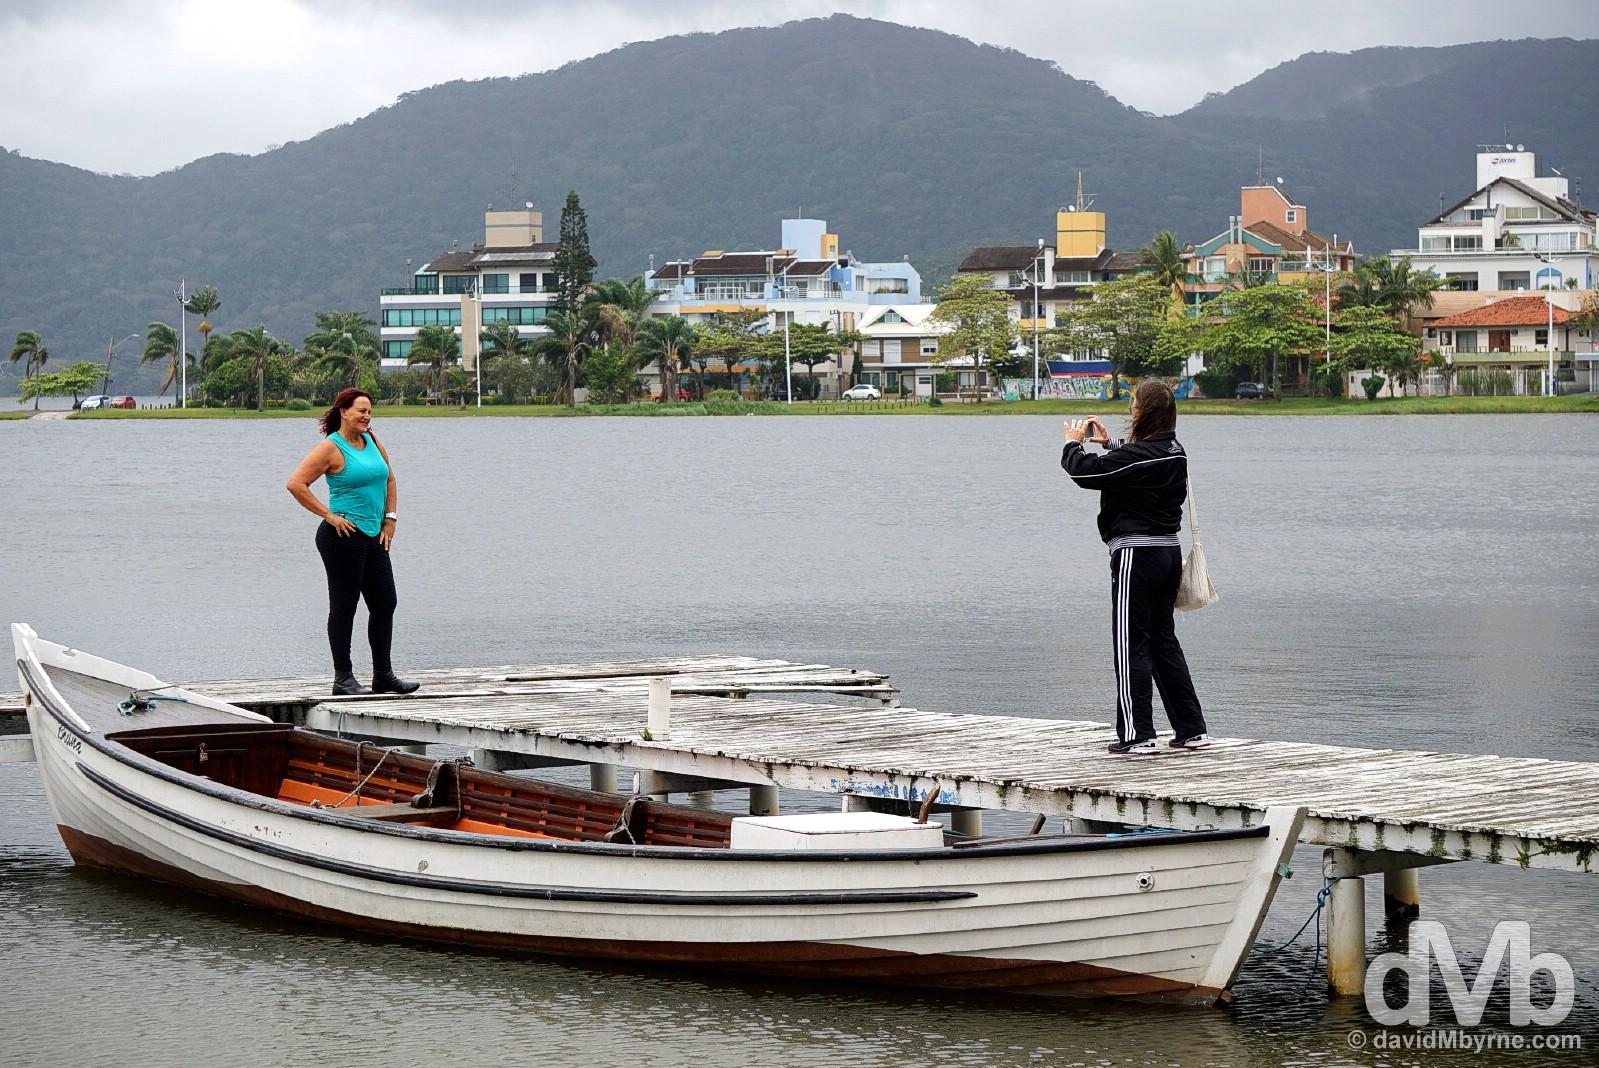 Lakeside in Centrinho da Lagoa on Ilah Santa Catarina, Brazil. September 17, 2015.